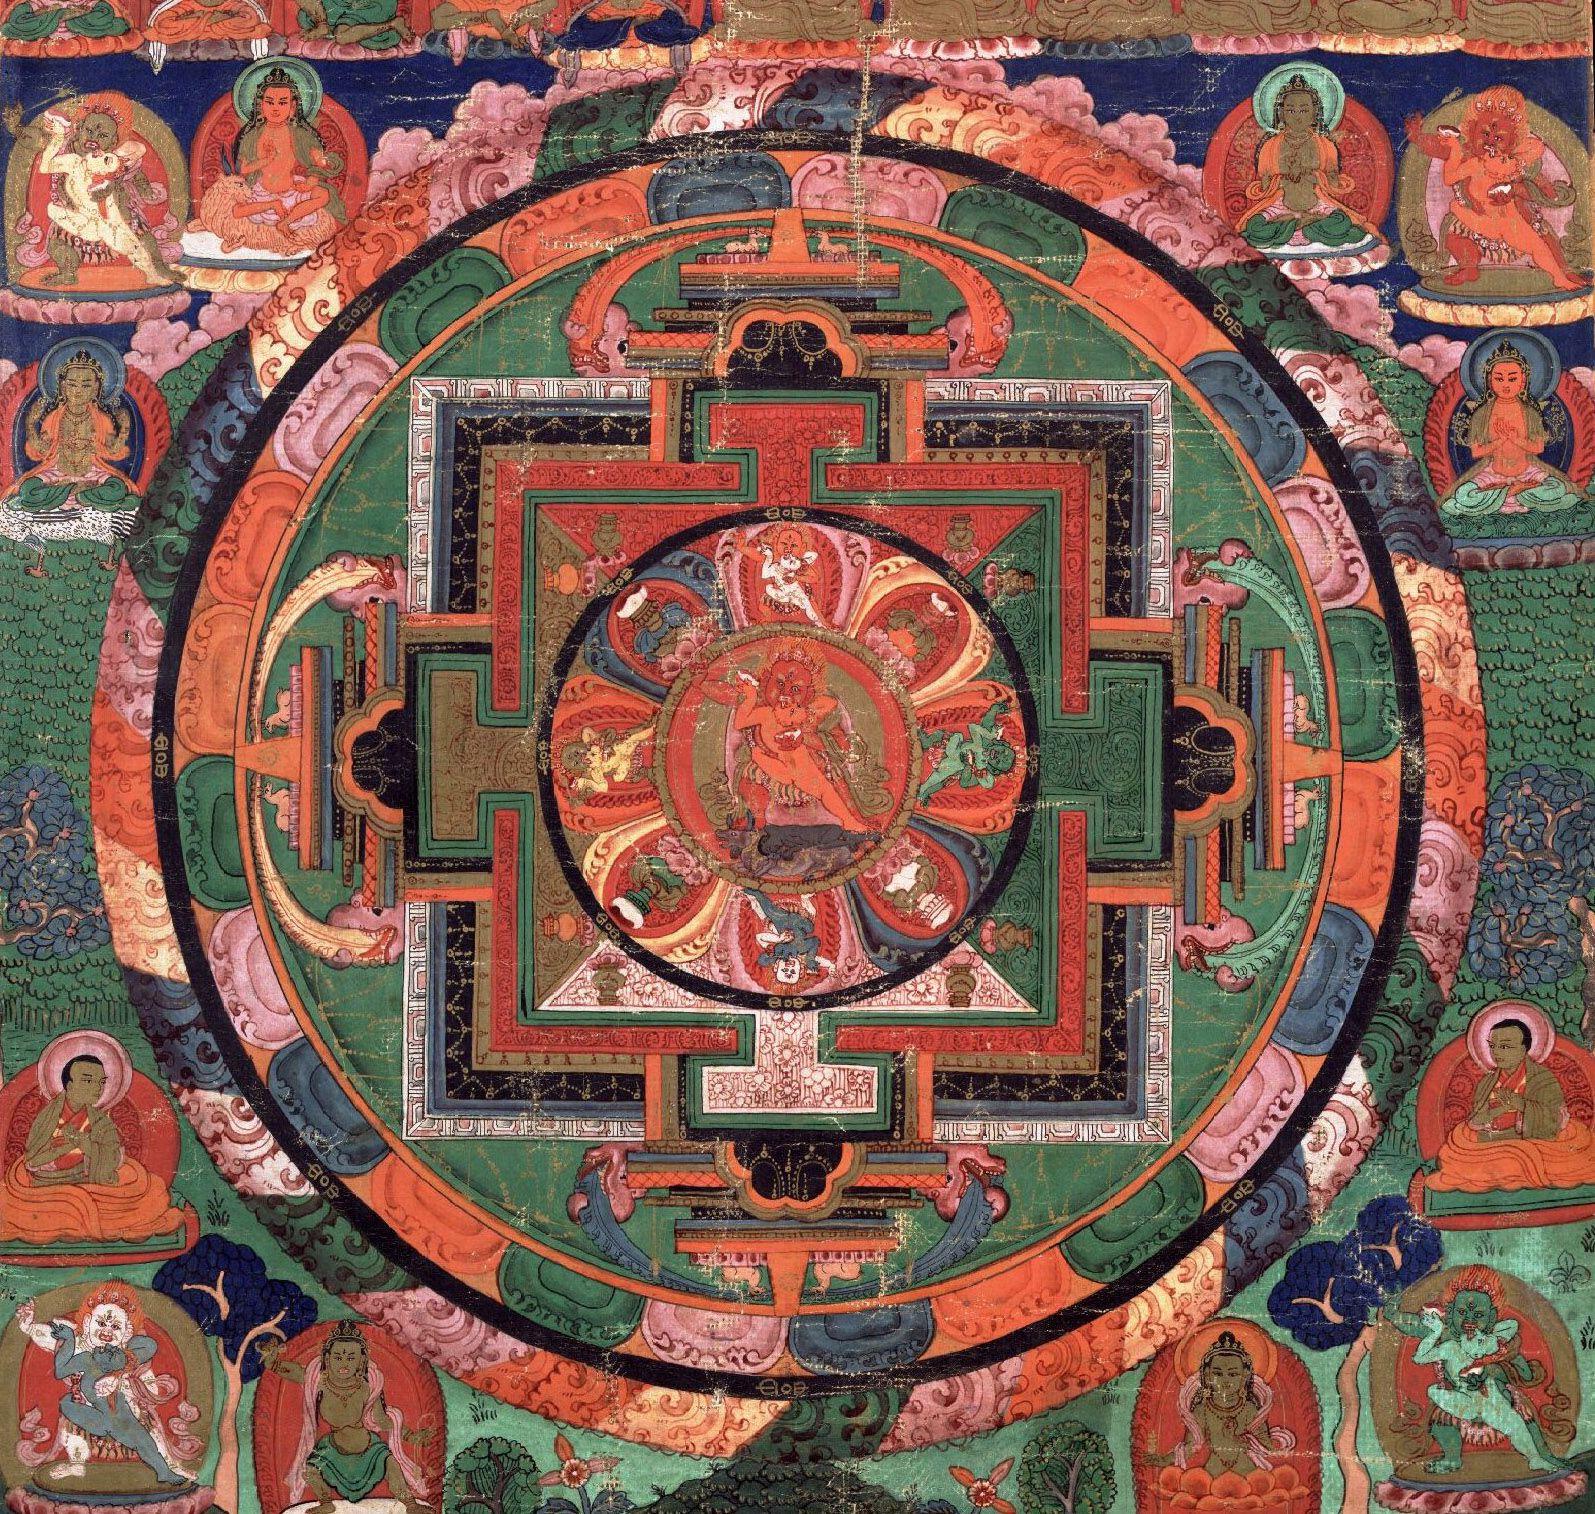 buddhist singles in diamond Shambhala meditation center of atlanta 1447 church st decatur, ga 30030 united states our location tel (404)370-9650 info@atlantashambhalacenterorg search.